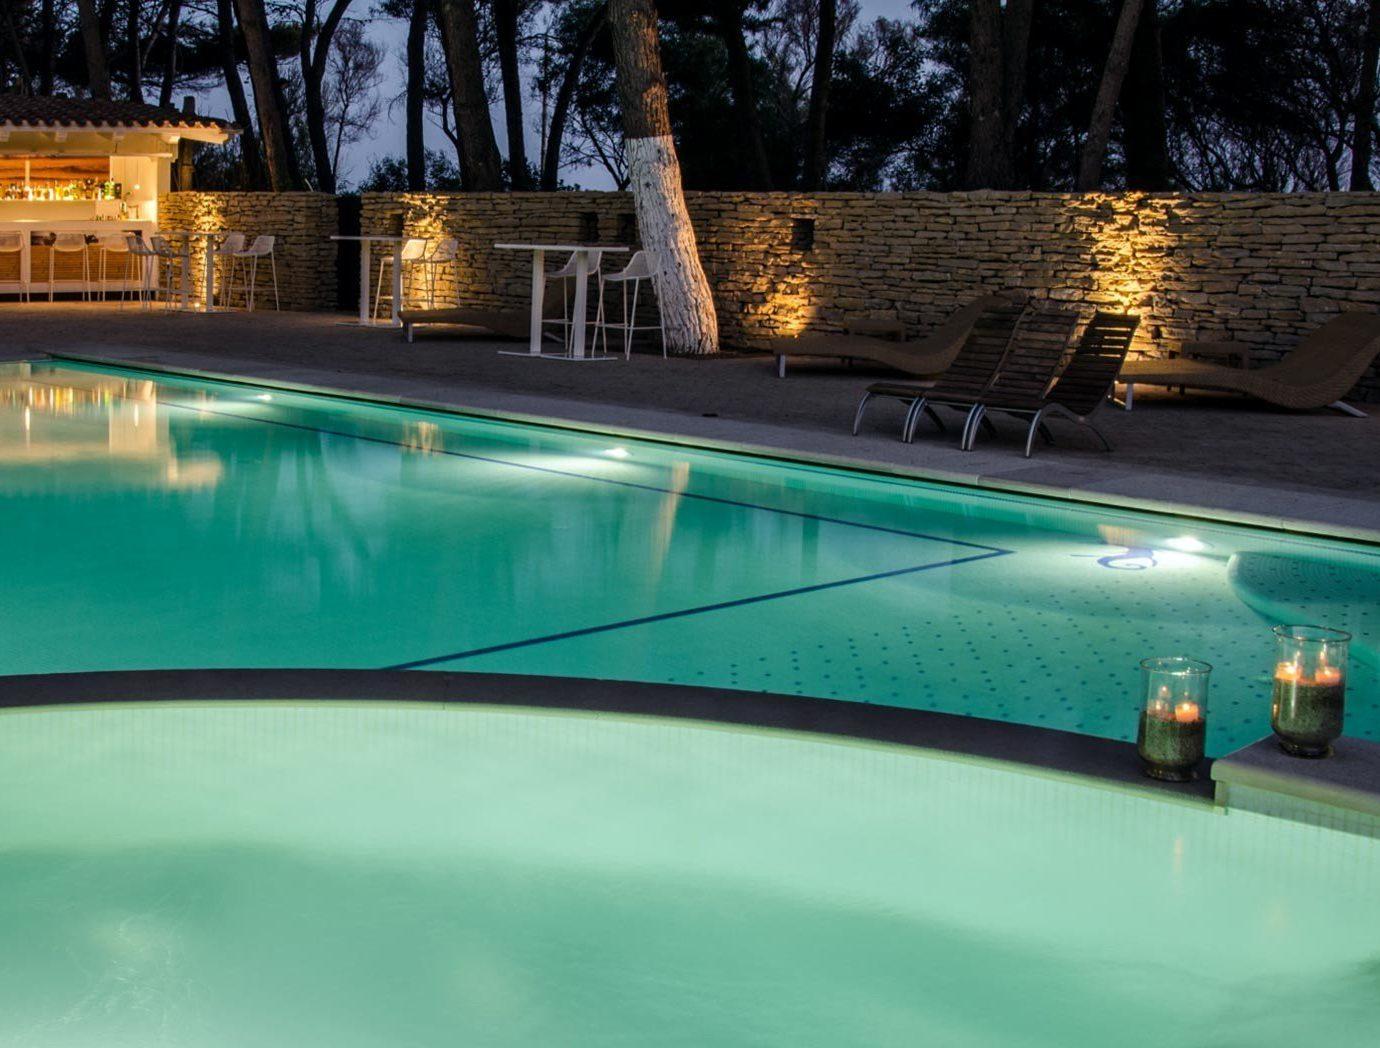 Bar Drink Elegant Lounge Nightlife Patio Pool Rustic swimming pool property leisure reflecting pool backyard blue